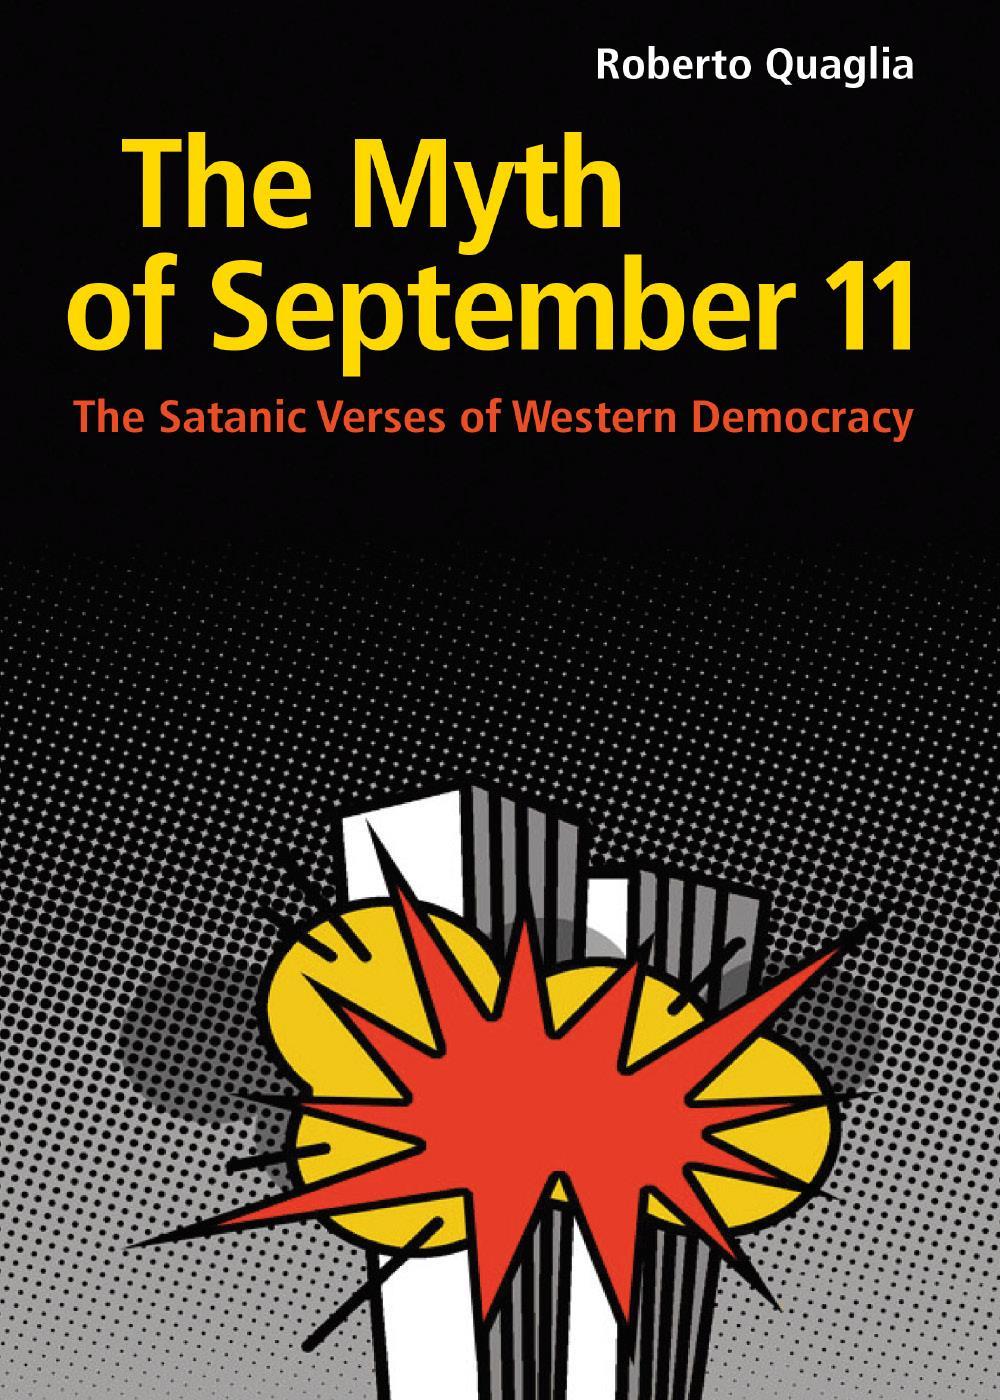 The Myth of September 11: The Satanic Verses of Western Democracy